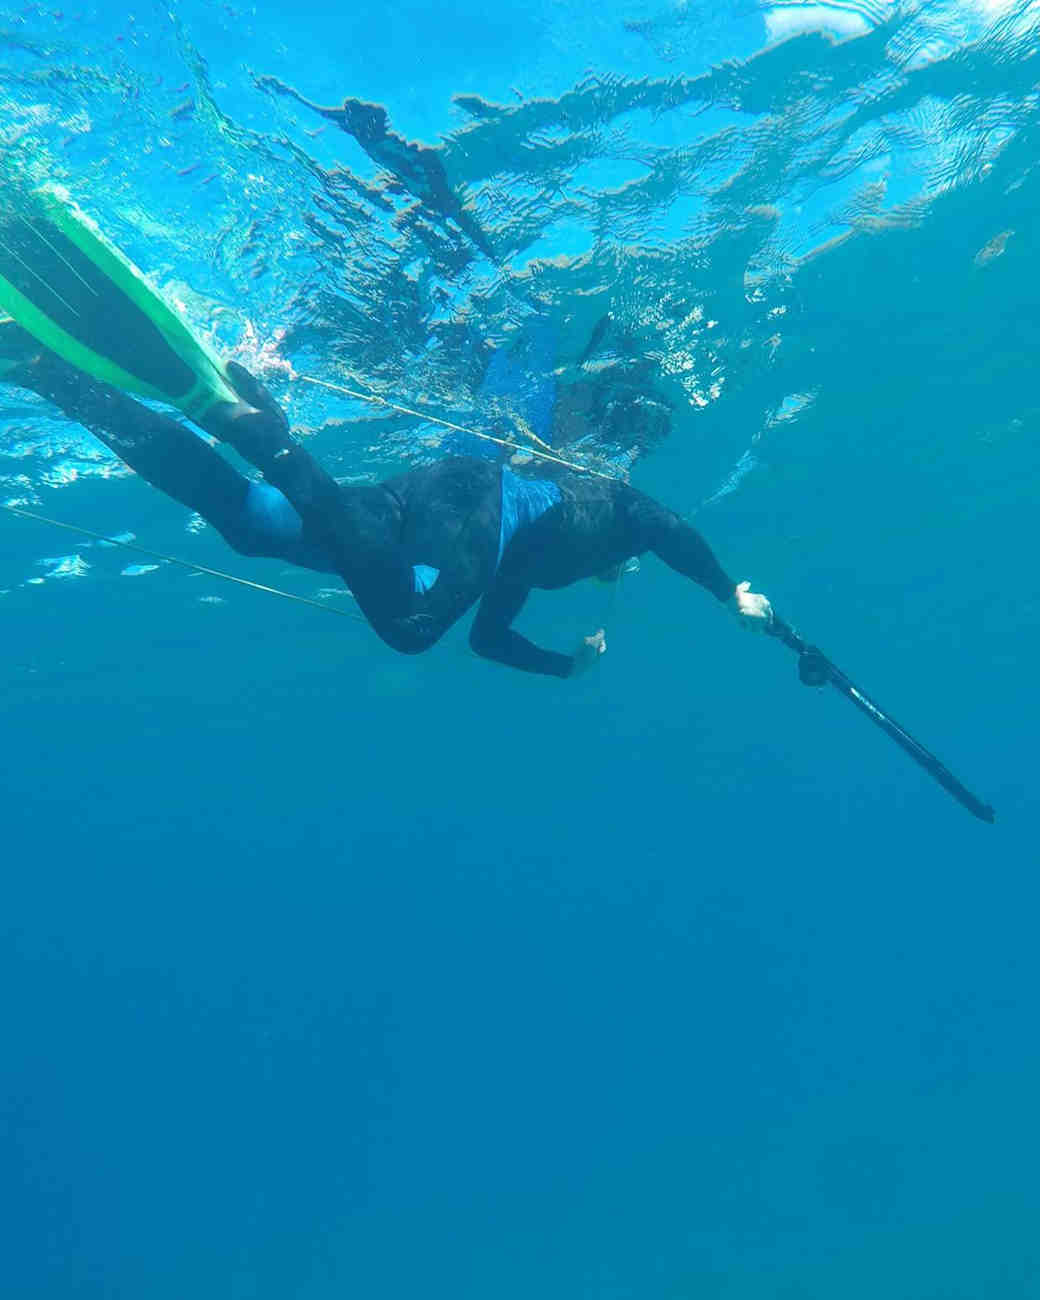 caribbean-aqua-montserret-snorkeling-0315.jpg